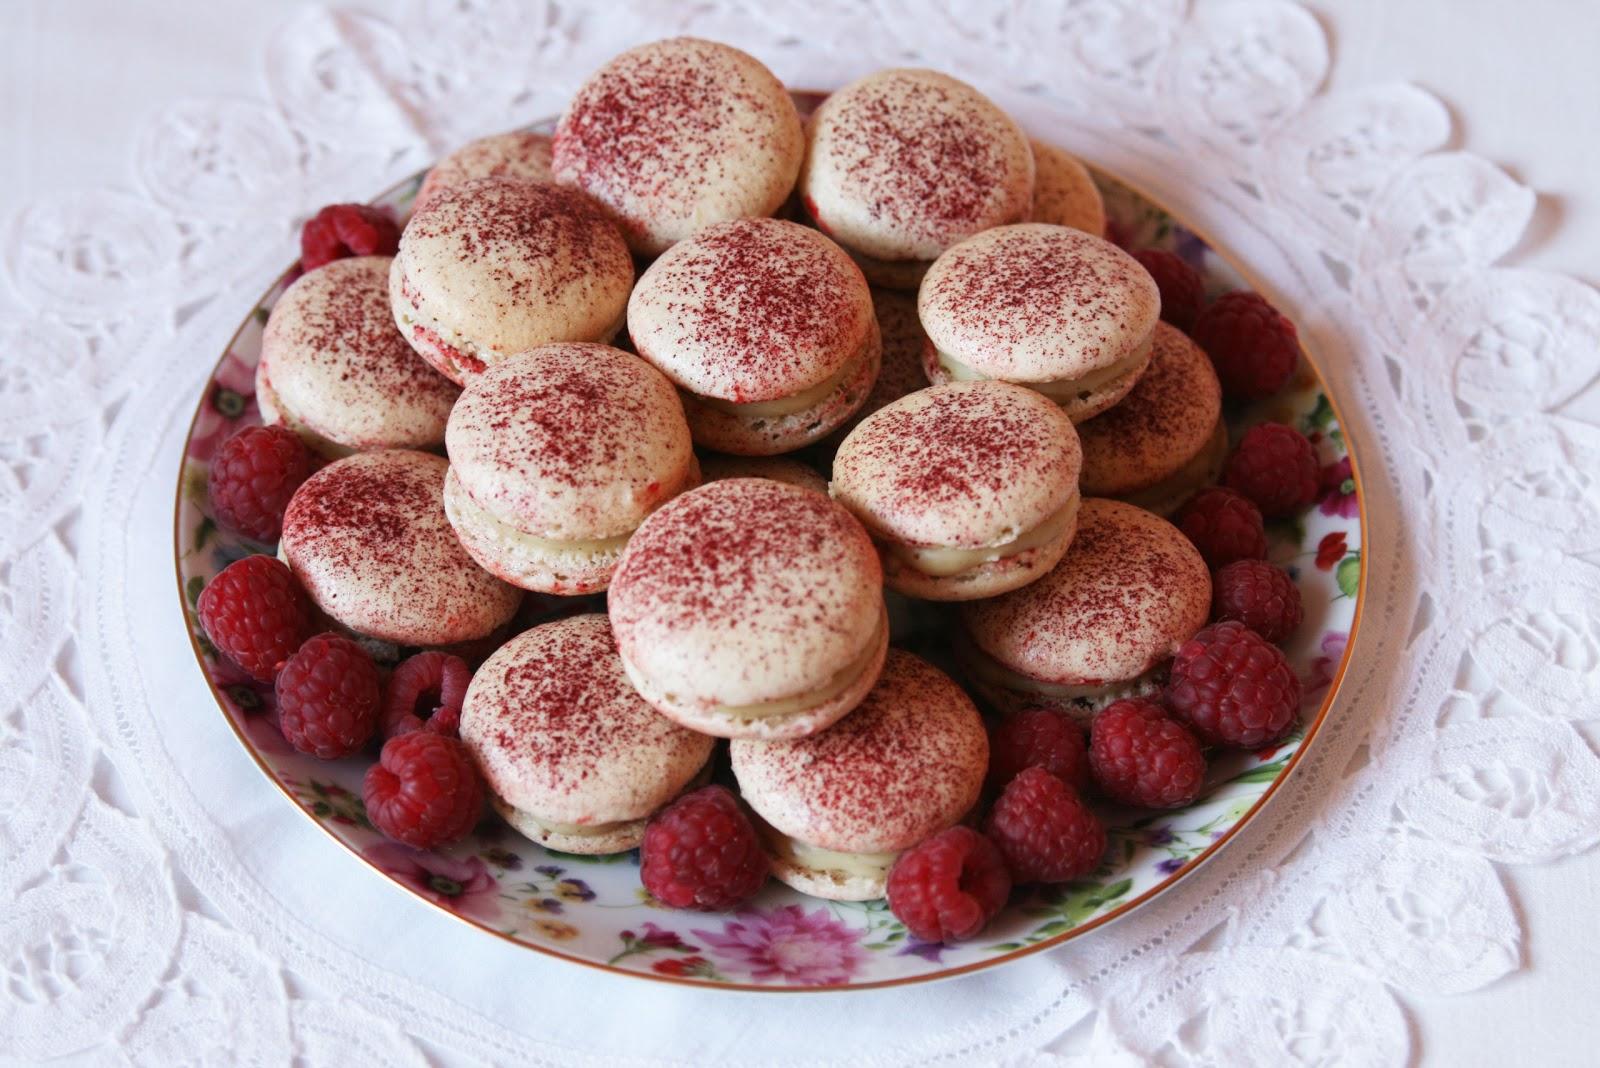 Cinnamon Girl White Chocolate And Raspberry Macarons